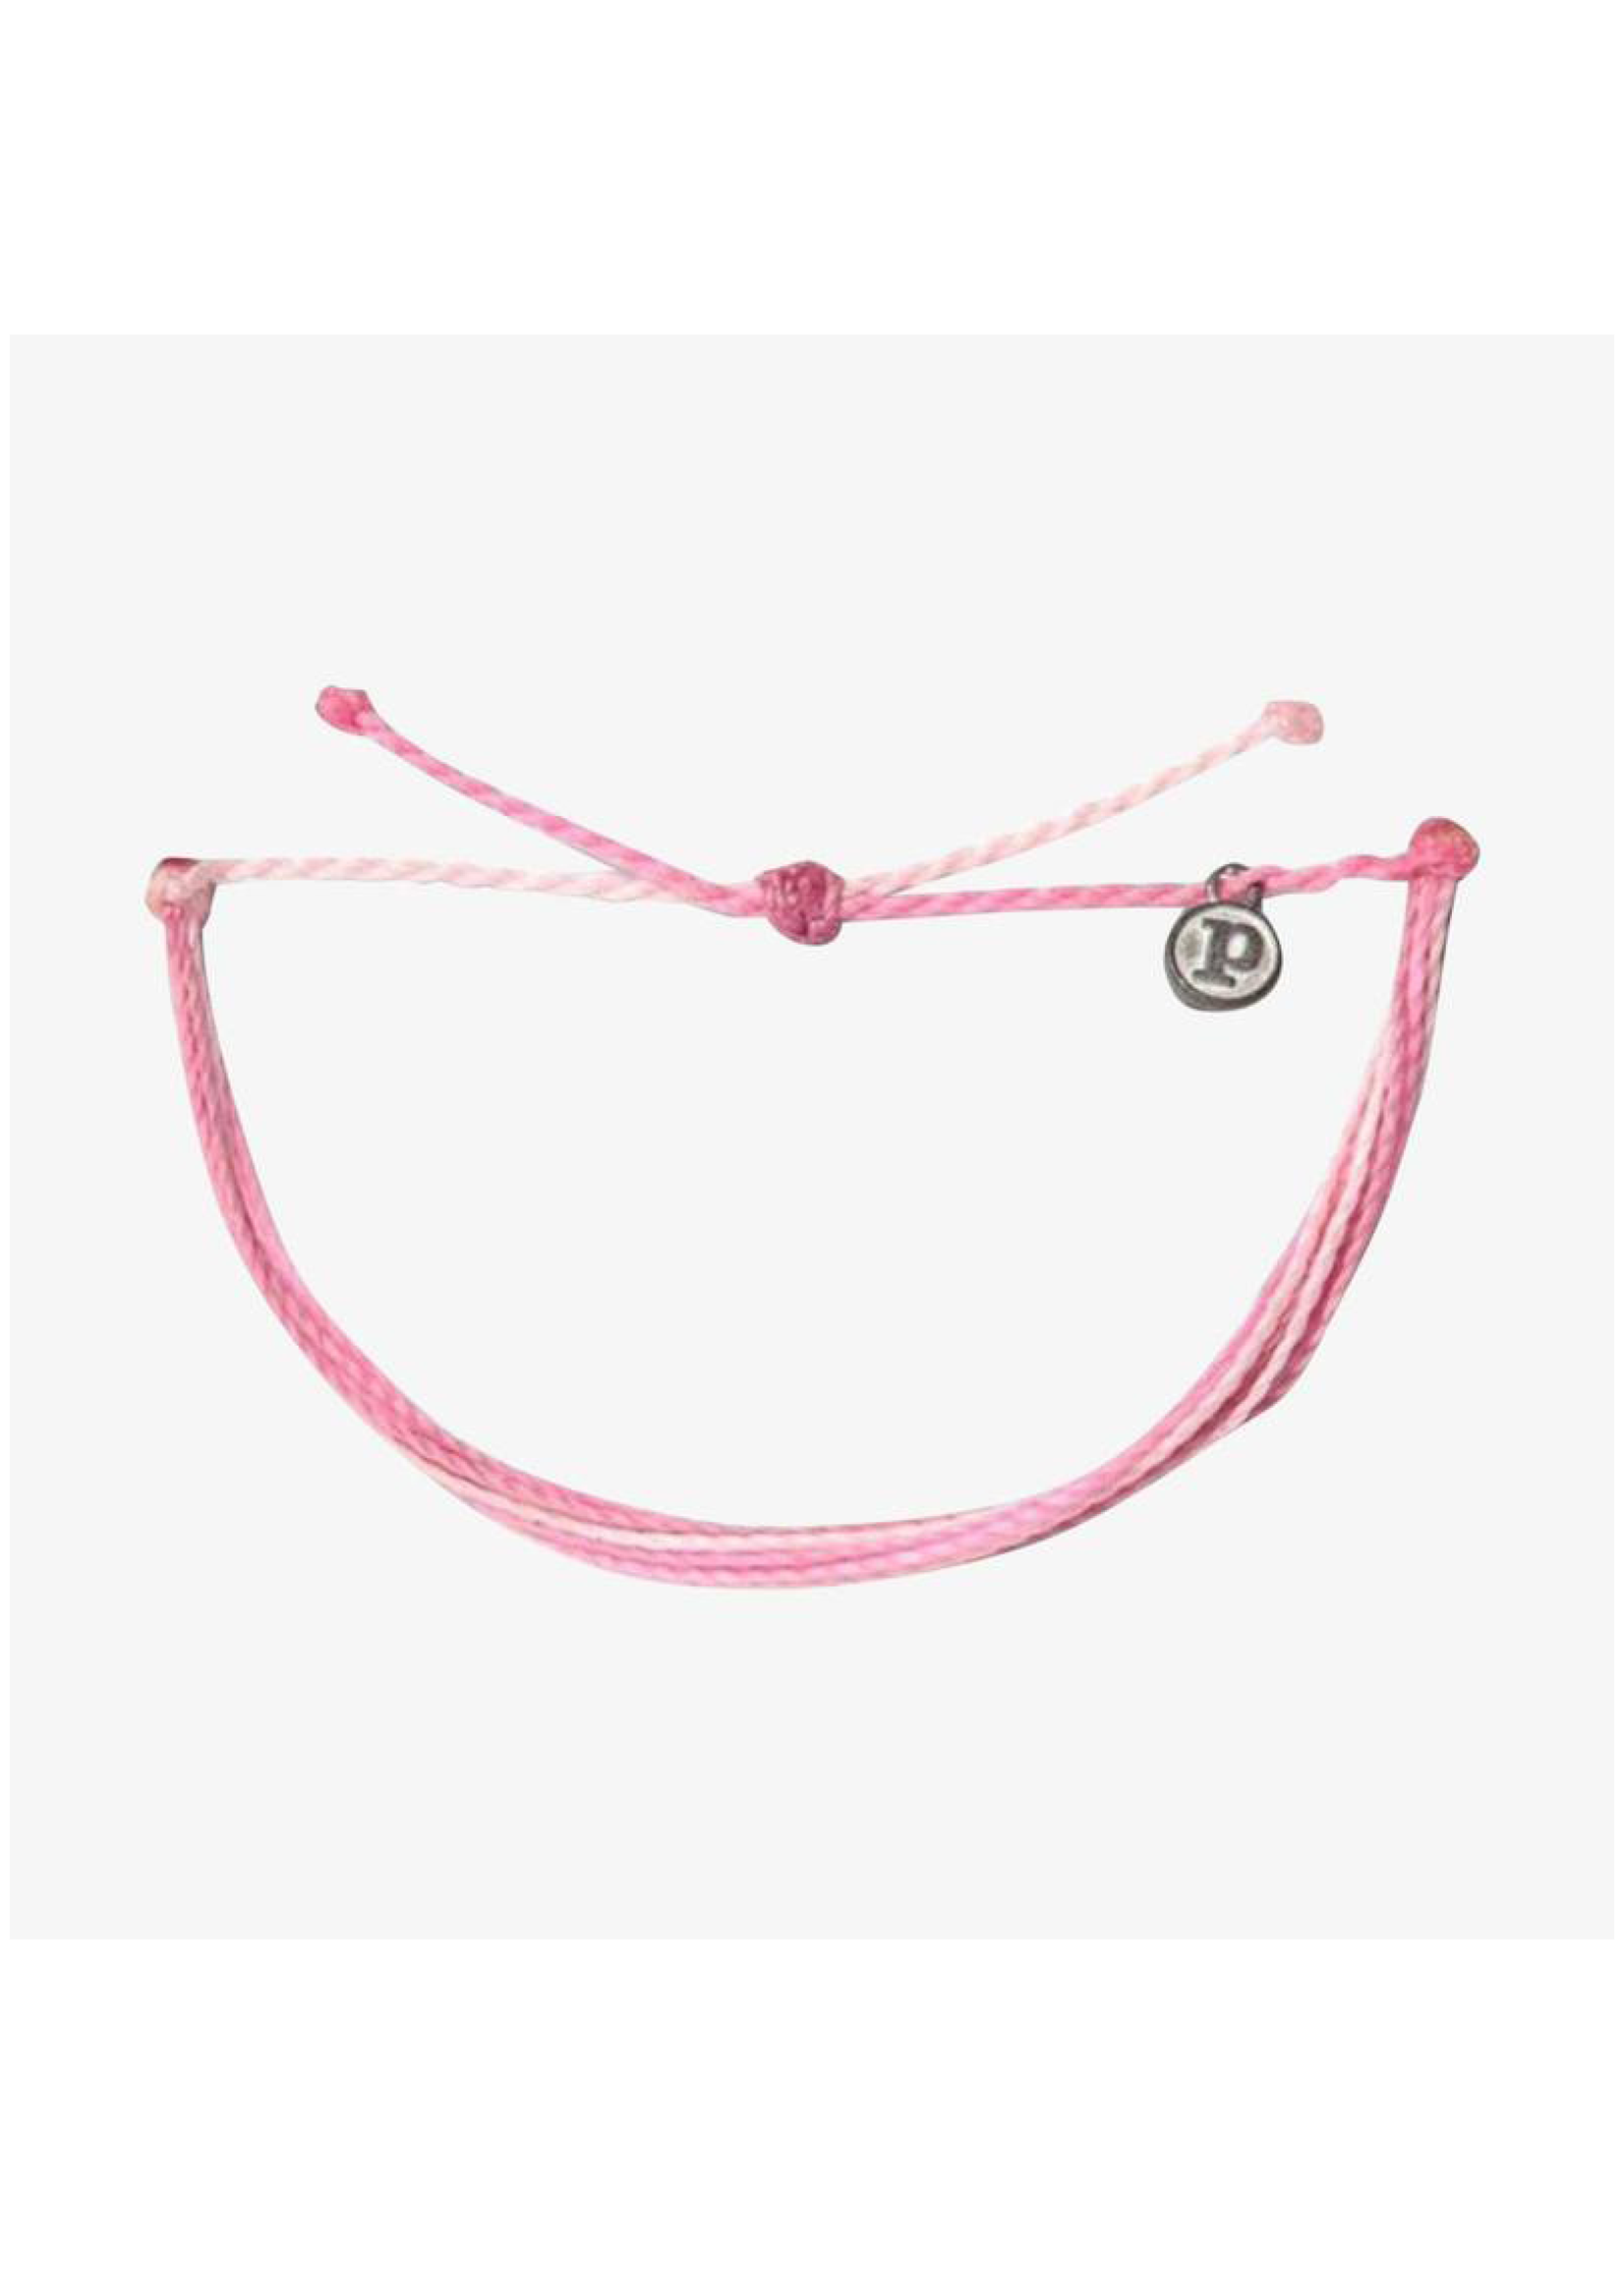 puravida bracelets Charity Boarding 4 Breast Cancer